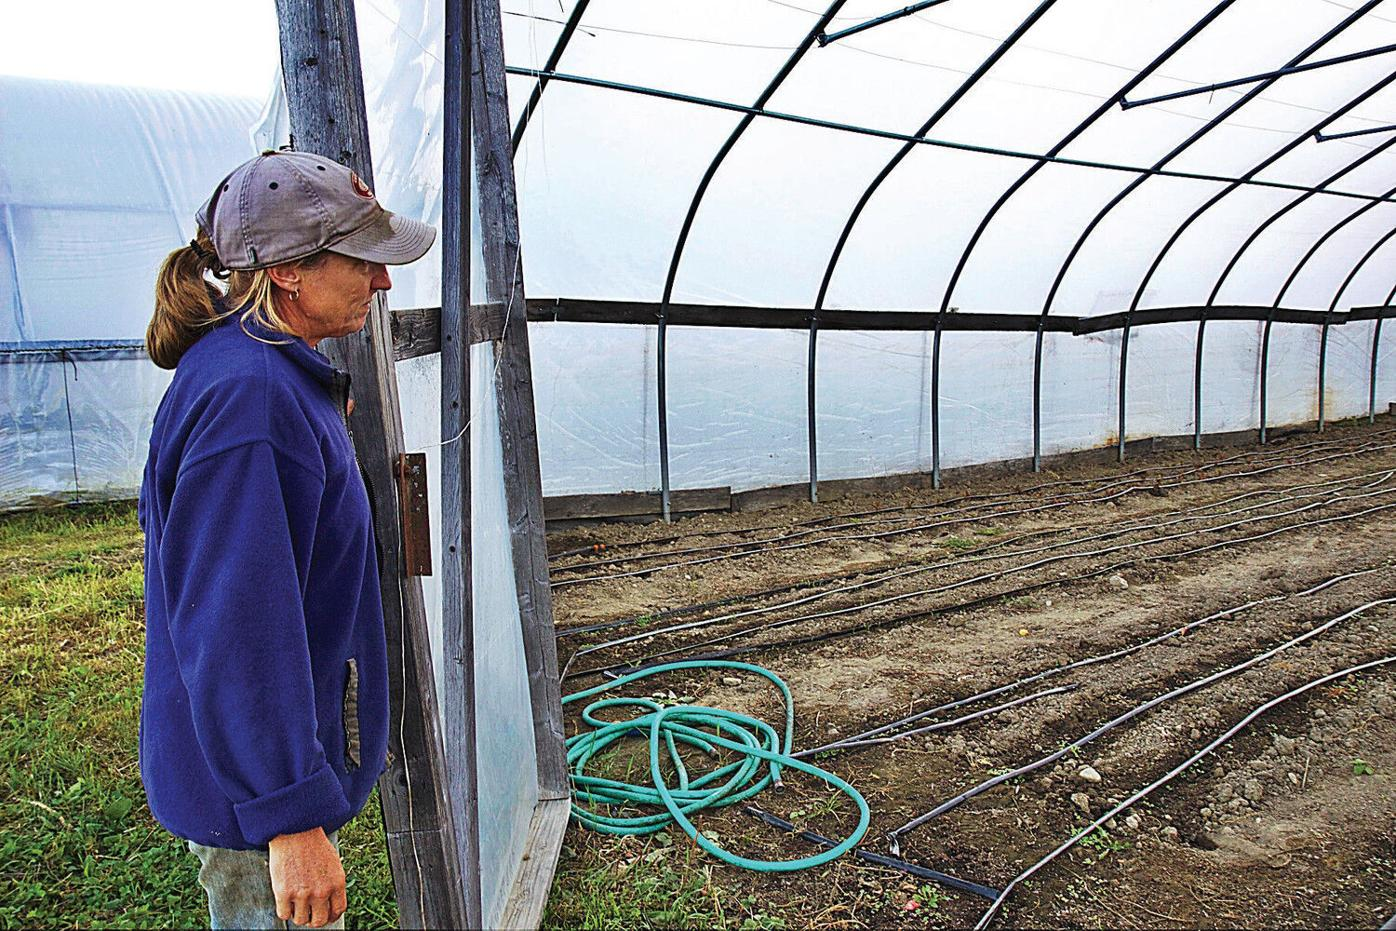 Honoring original CSA's legacy at Indian Line Farm